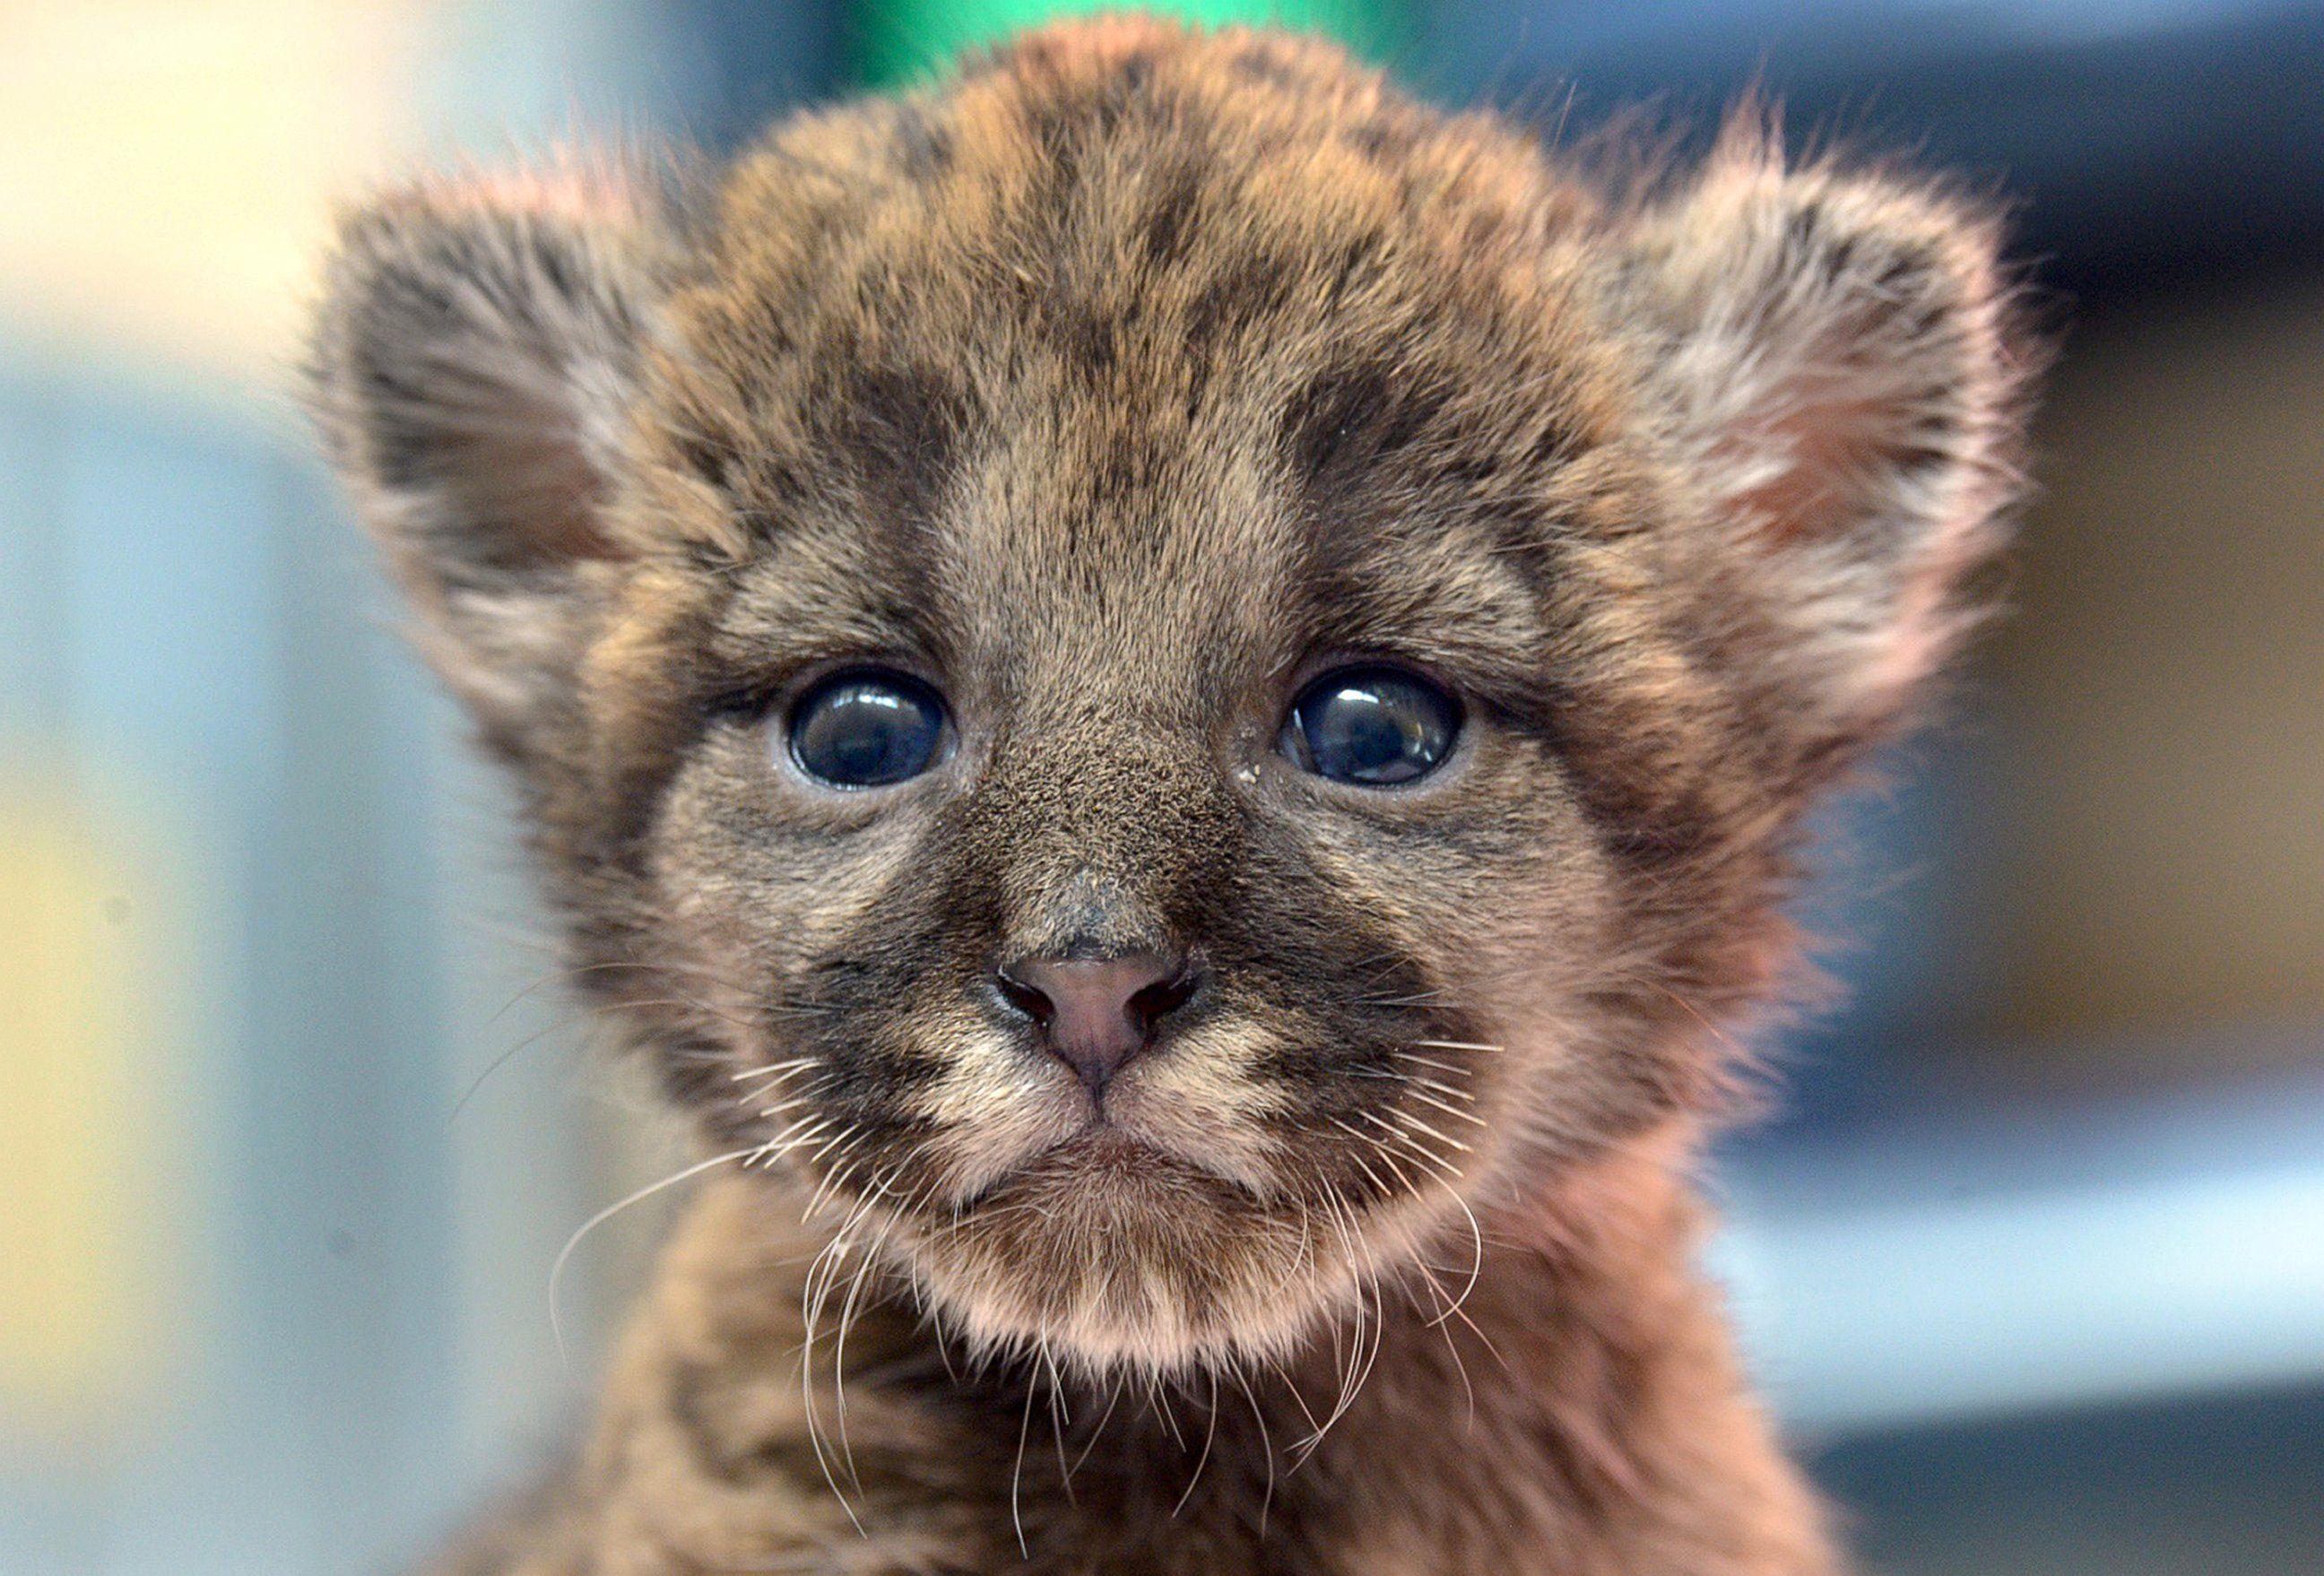 Precious Panther Cub Makes His Debut